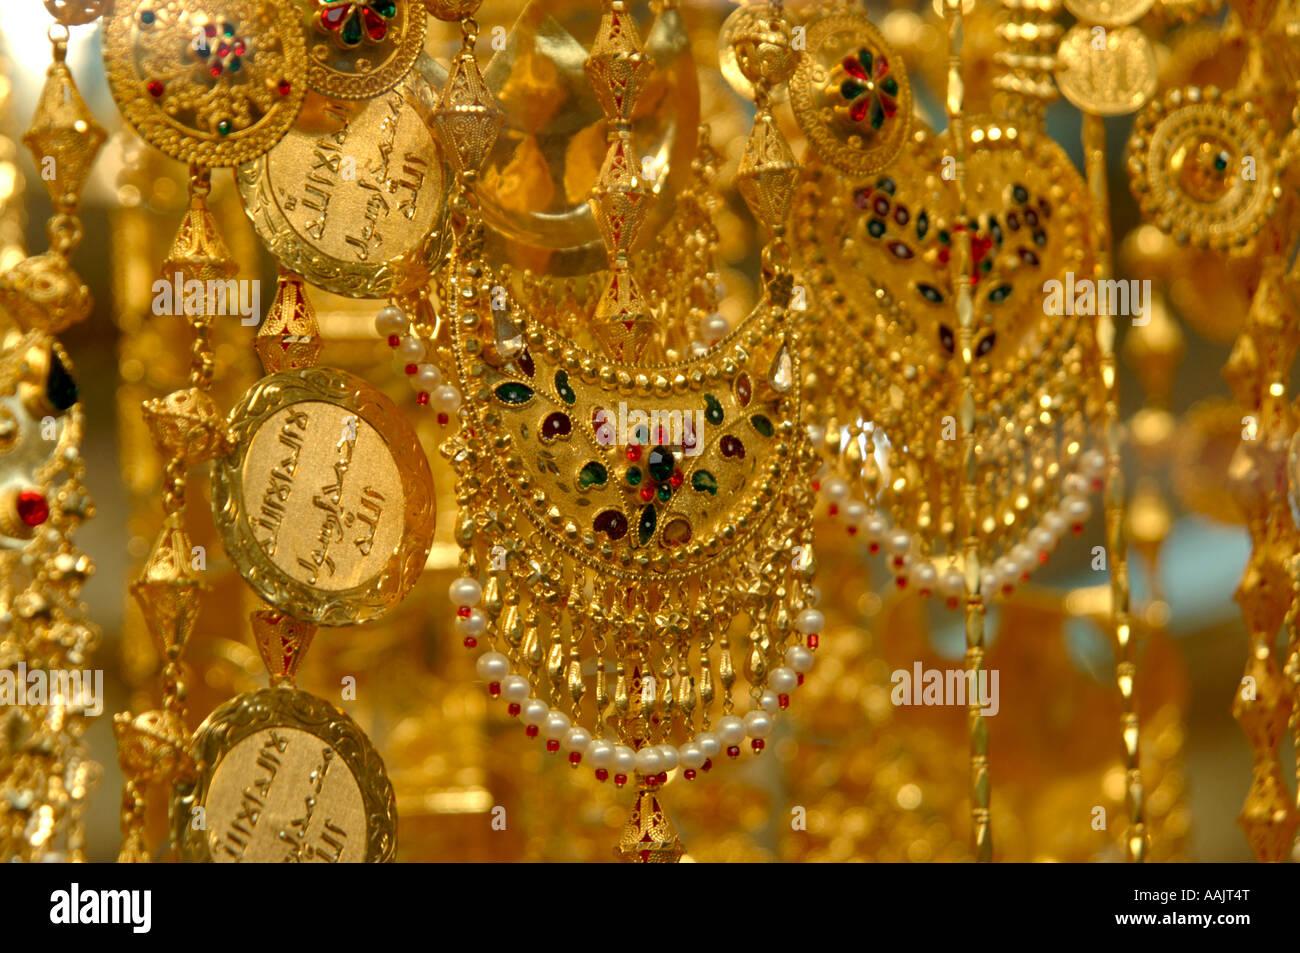 Gold necklaces at Gold souk, Dubai - Stock Image